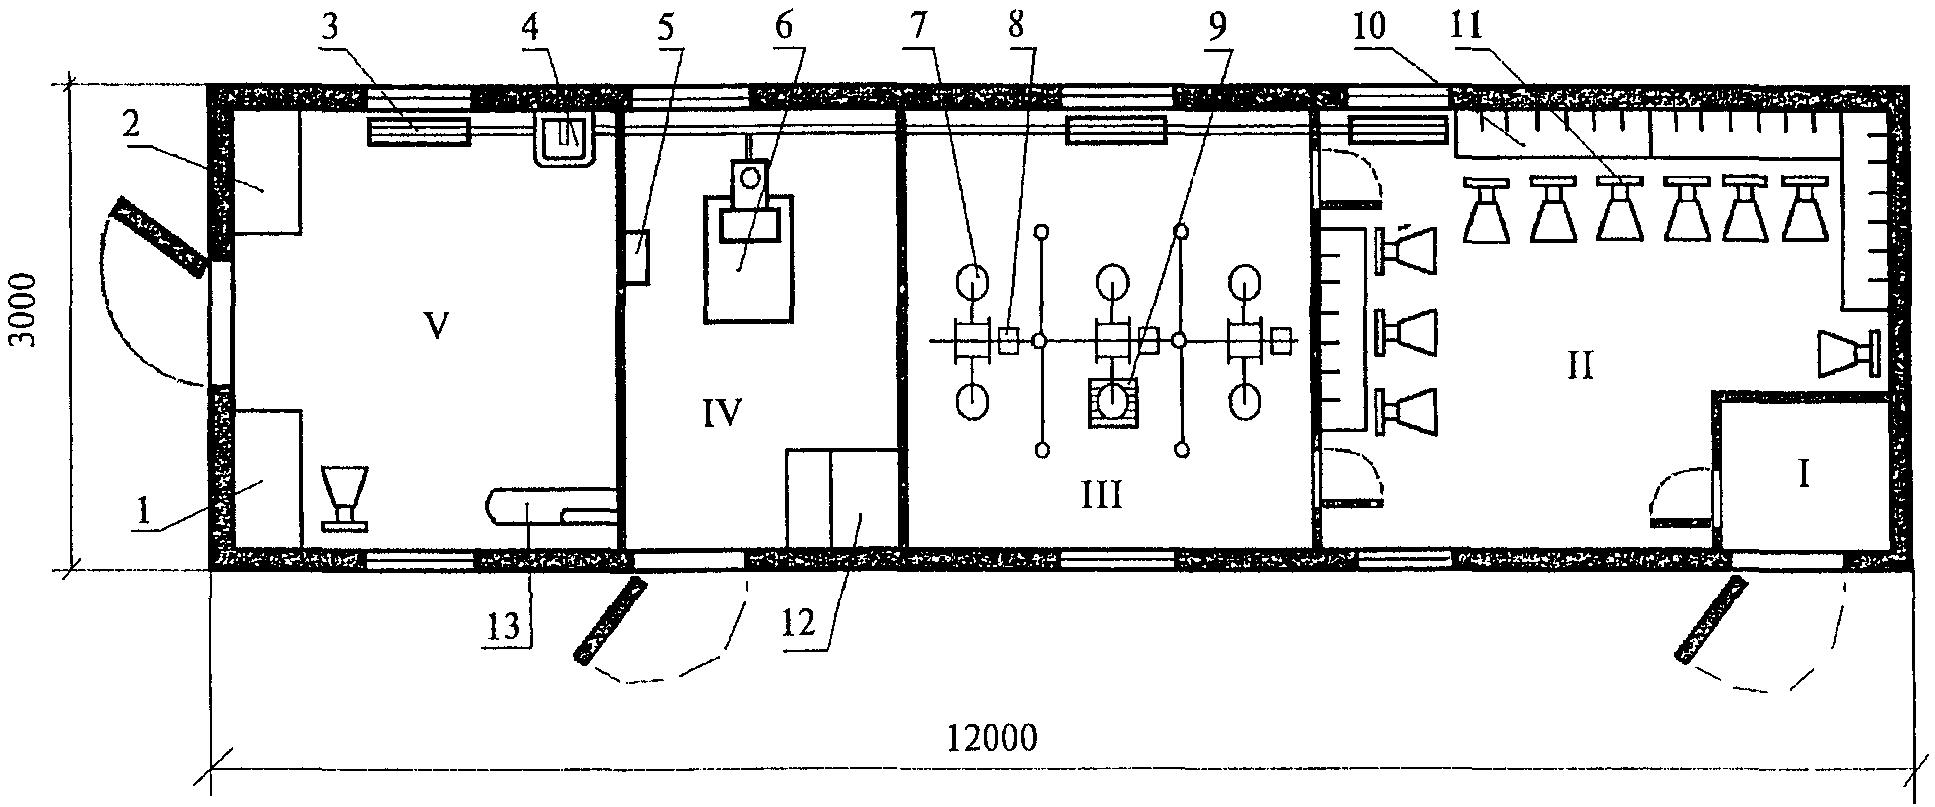 образец план производства работ поставки конструкций на объект